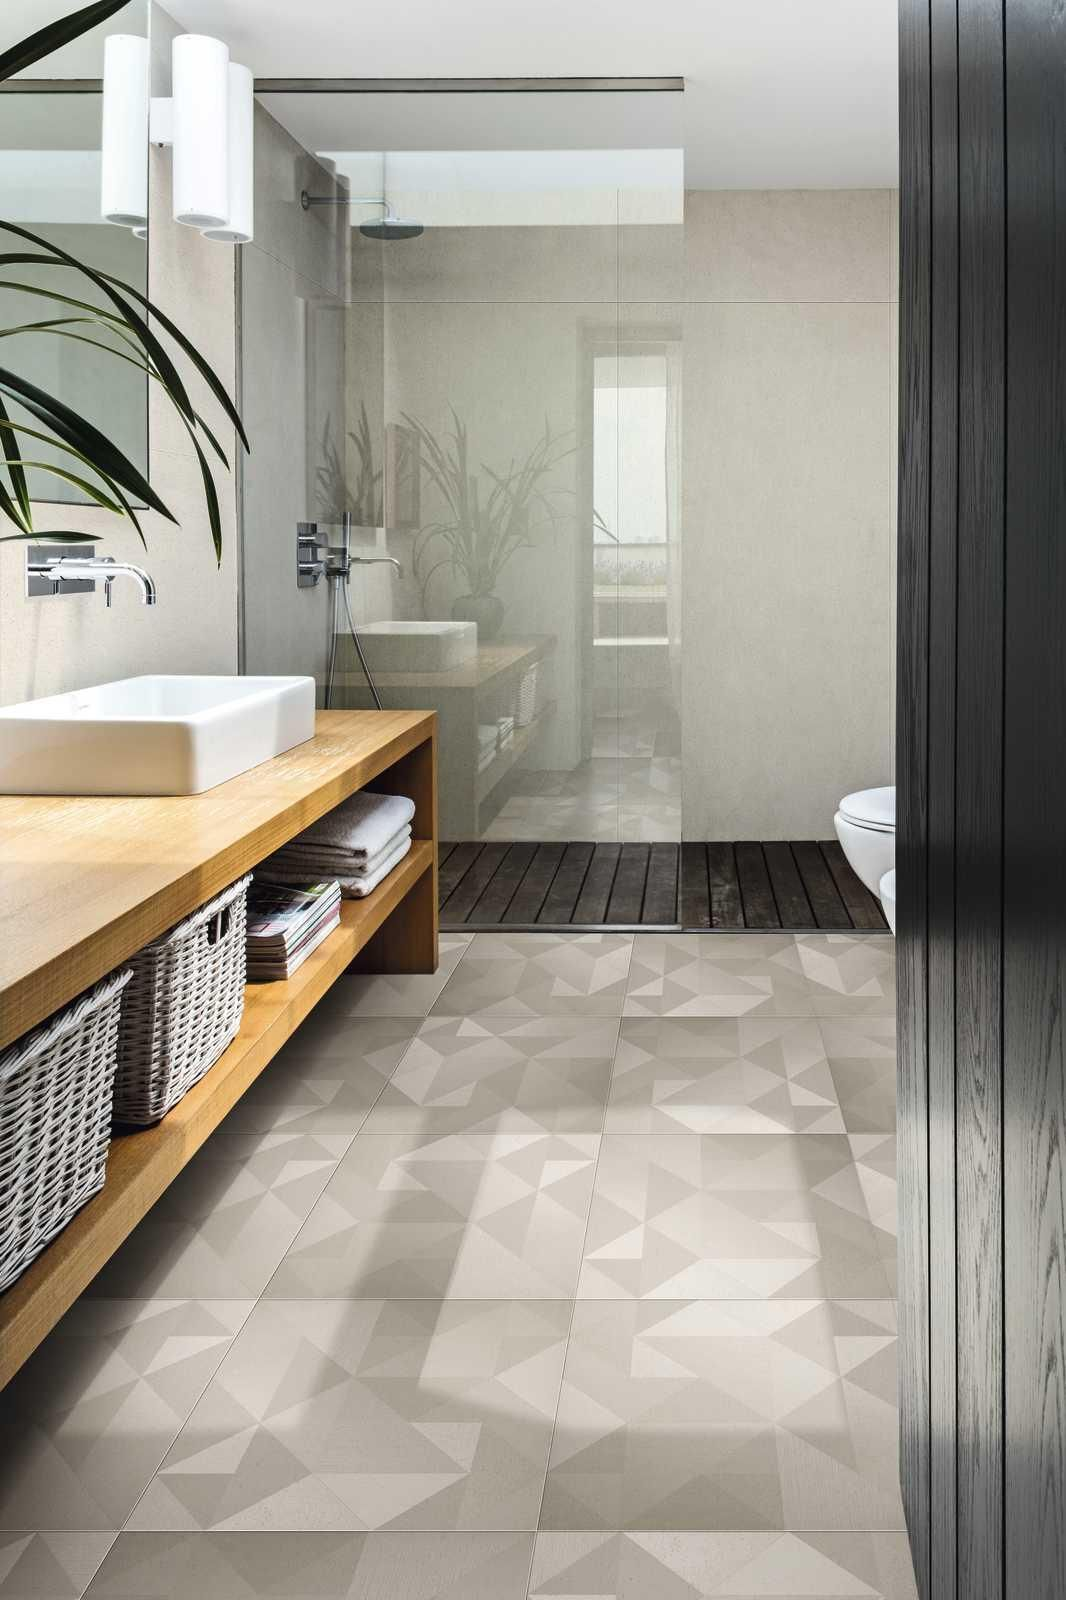 Bathroom Floor Tile Design Ideas Bathroomfloortile Bathroom Floor Tile Color Ideas Bat Ceramic Tile Floor Bathroom Bathroom Tile Designs Bathroom Floor Tiles